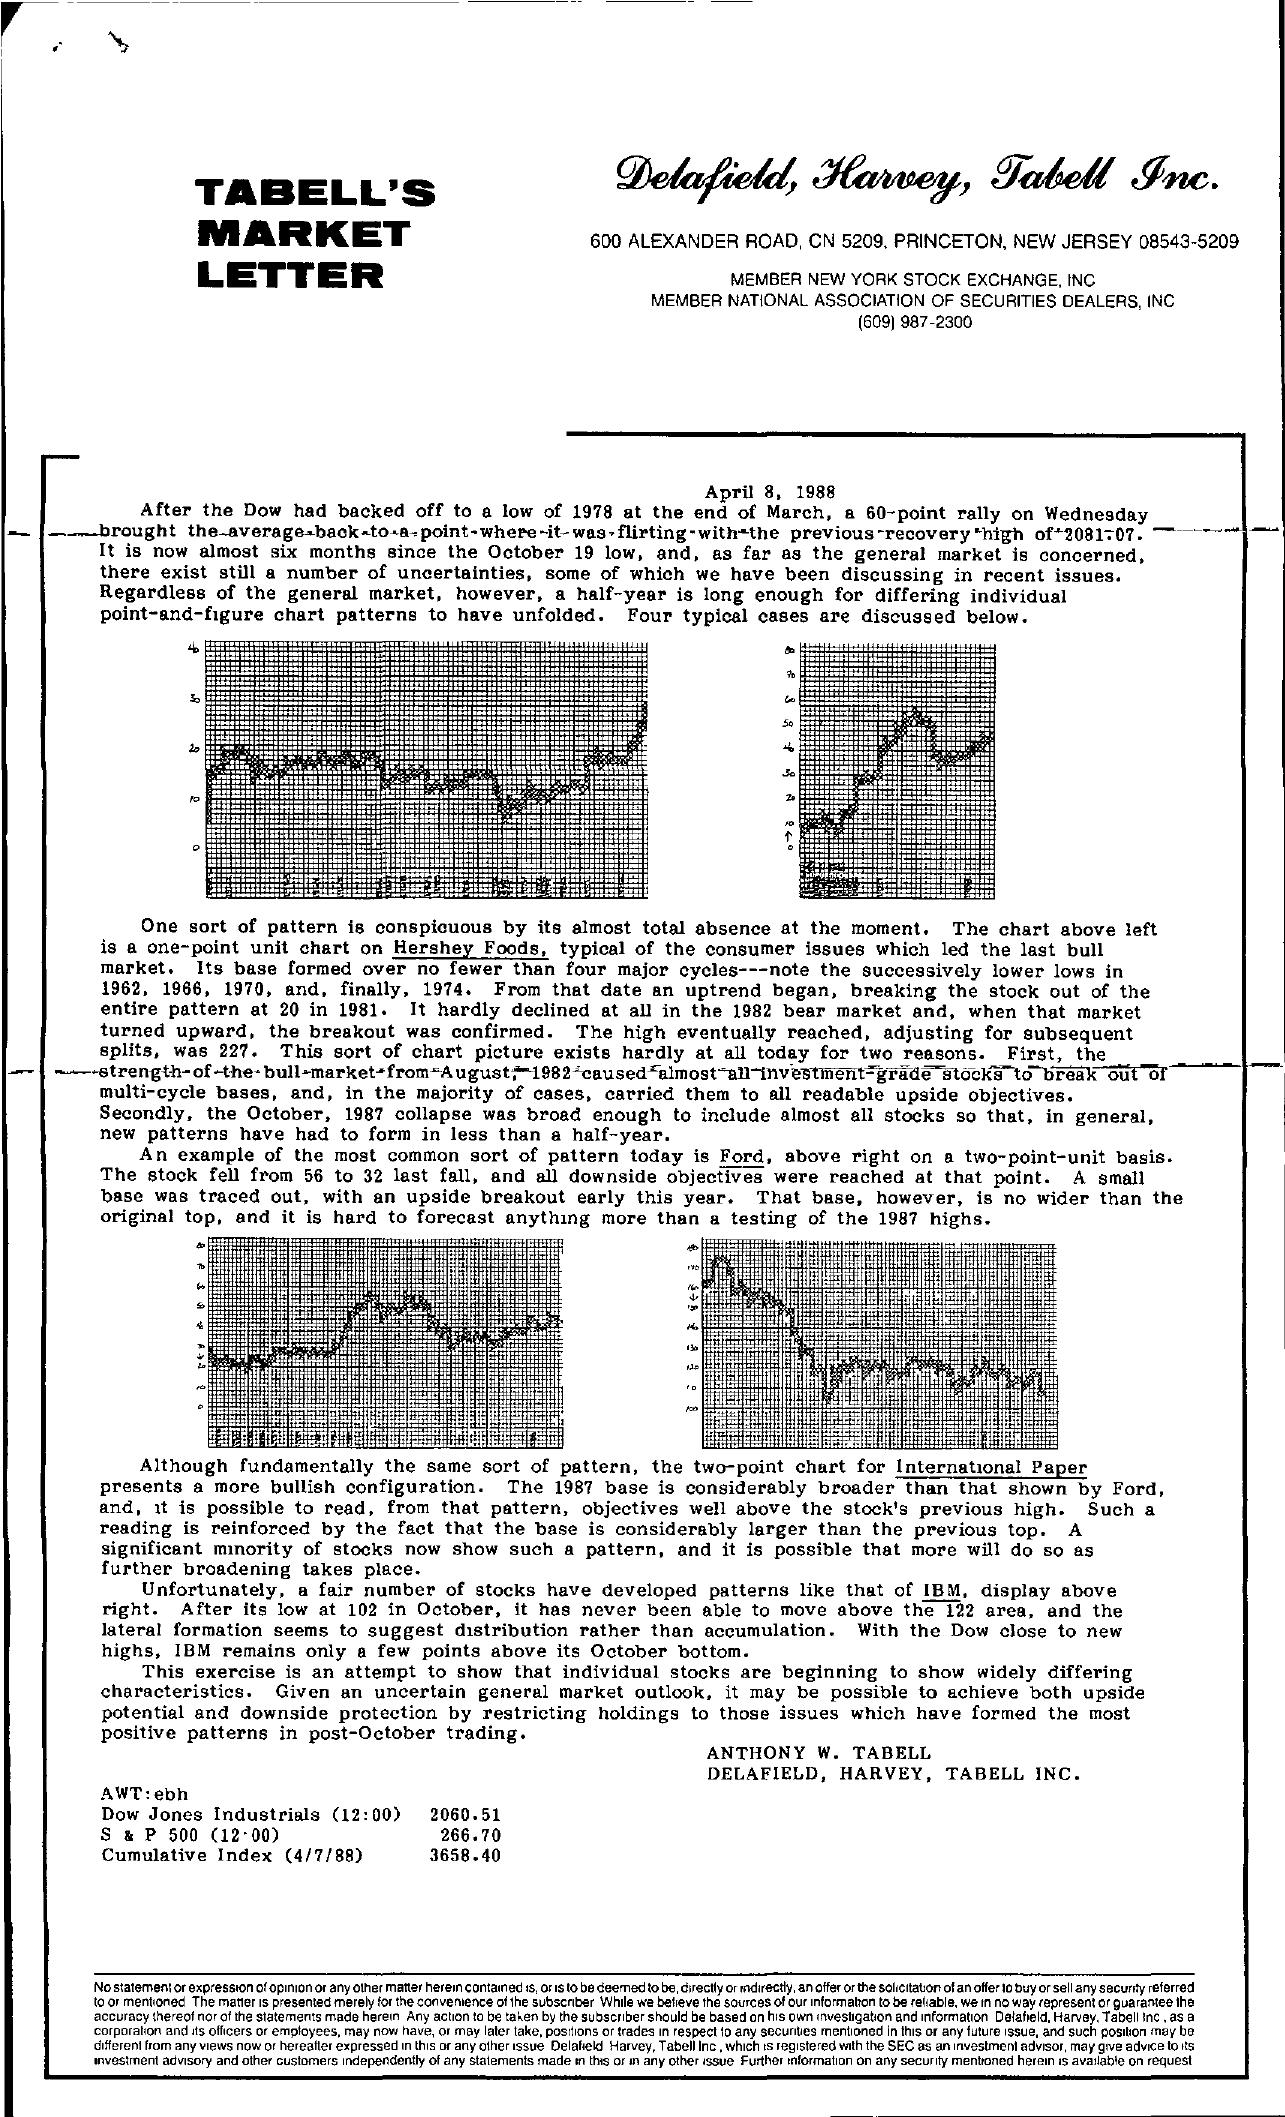 Tabell's Market Letter - April 08, 1988